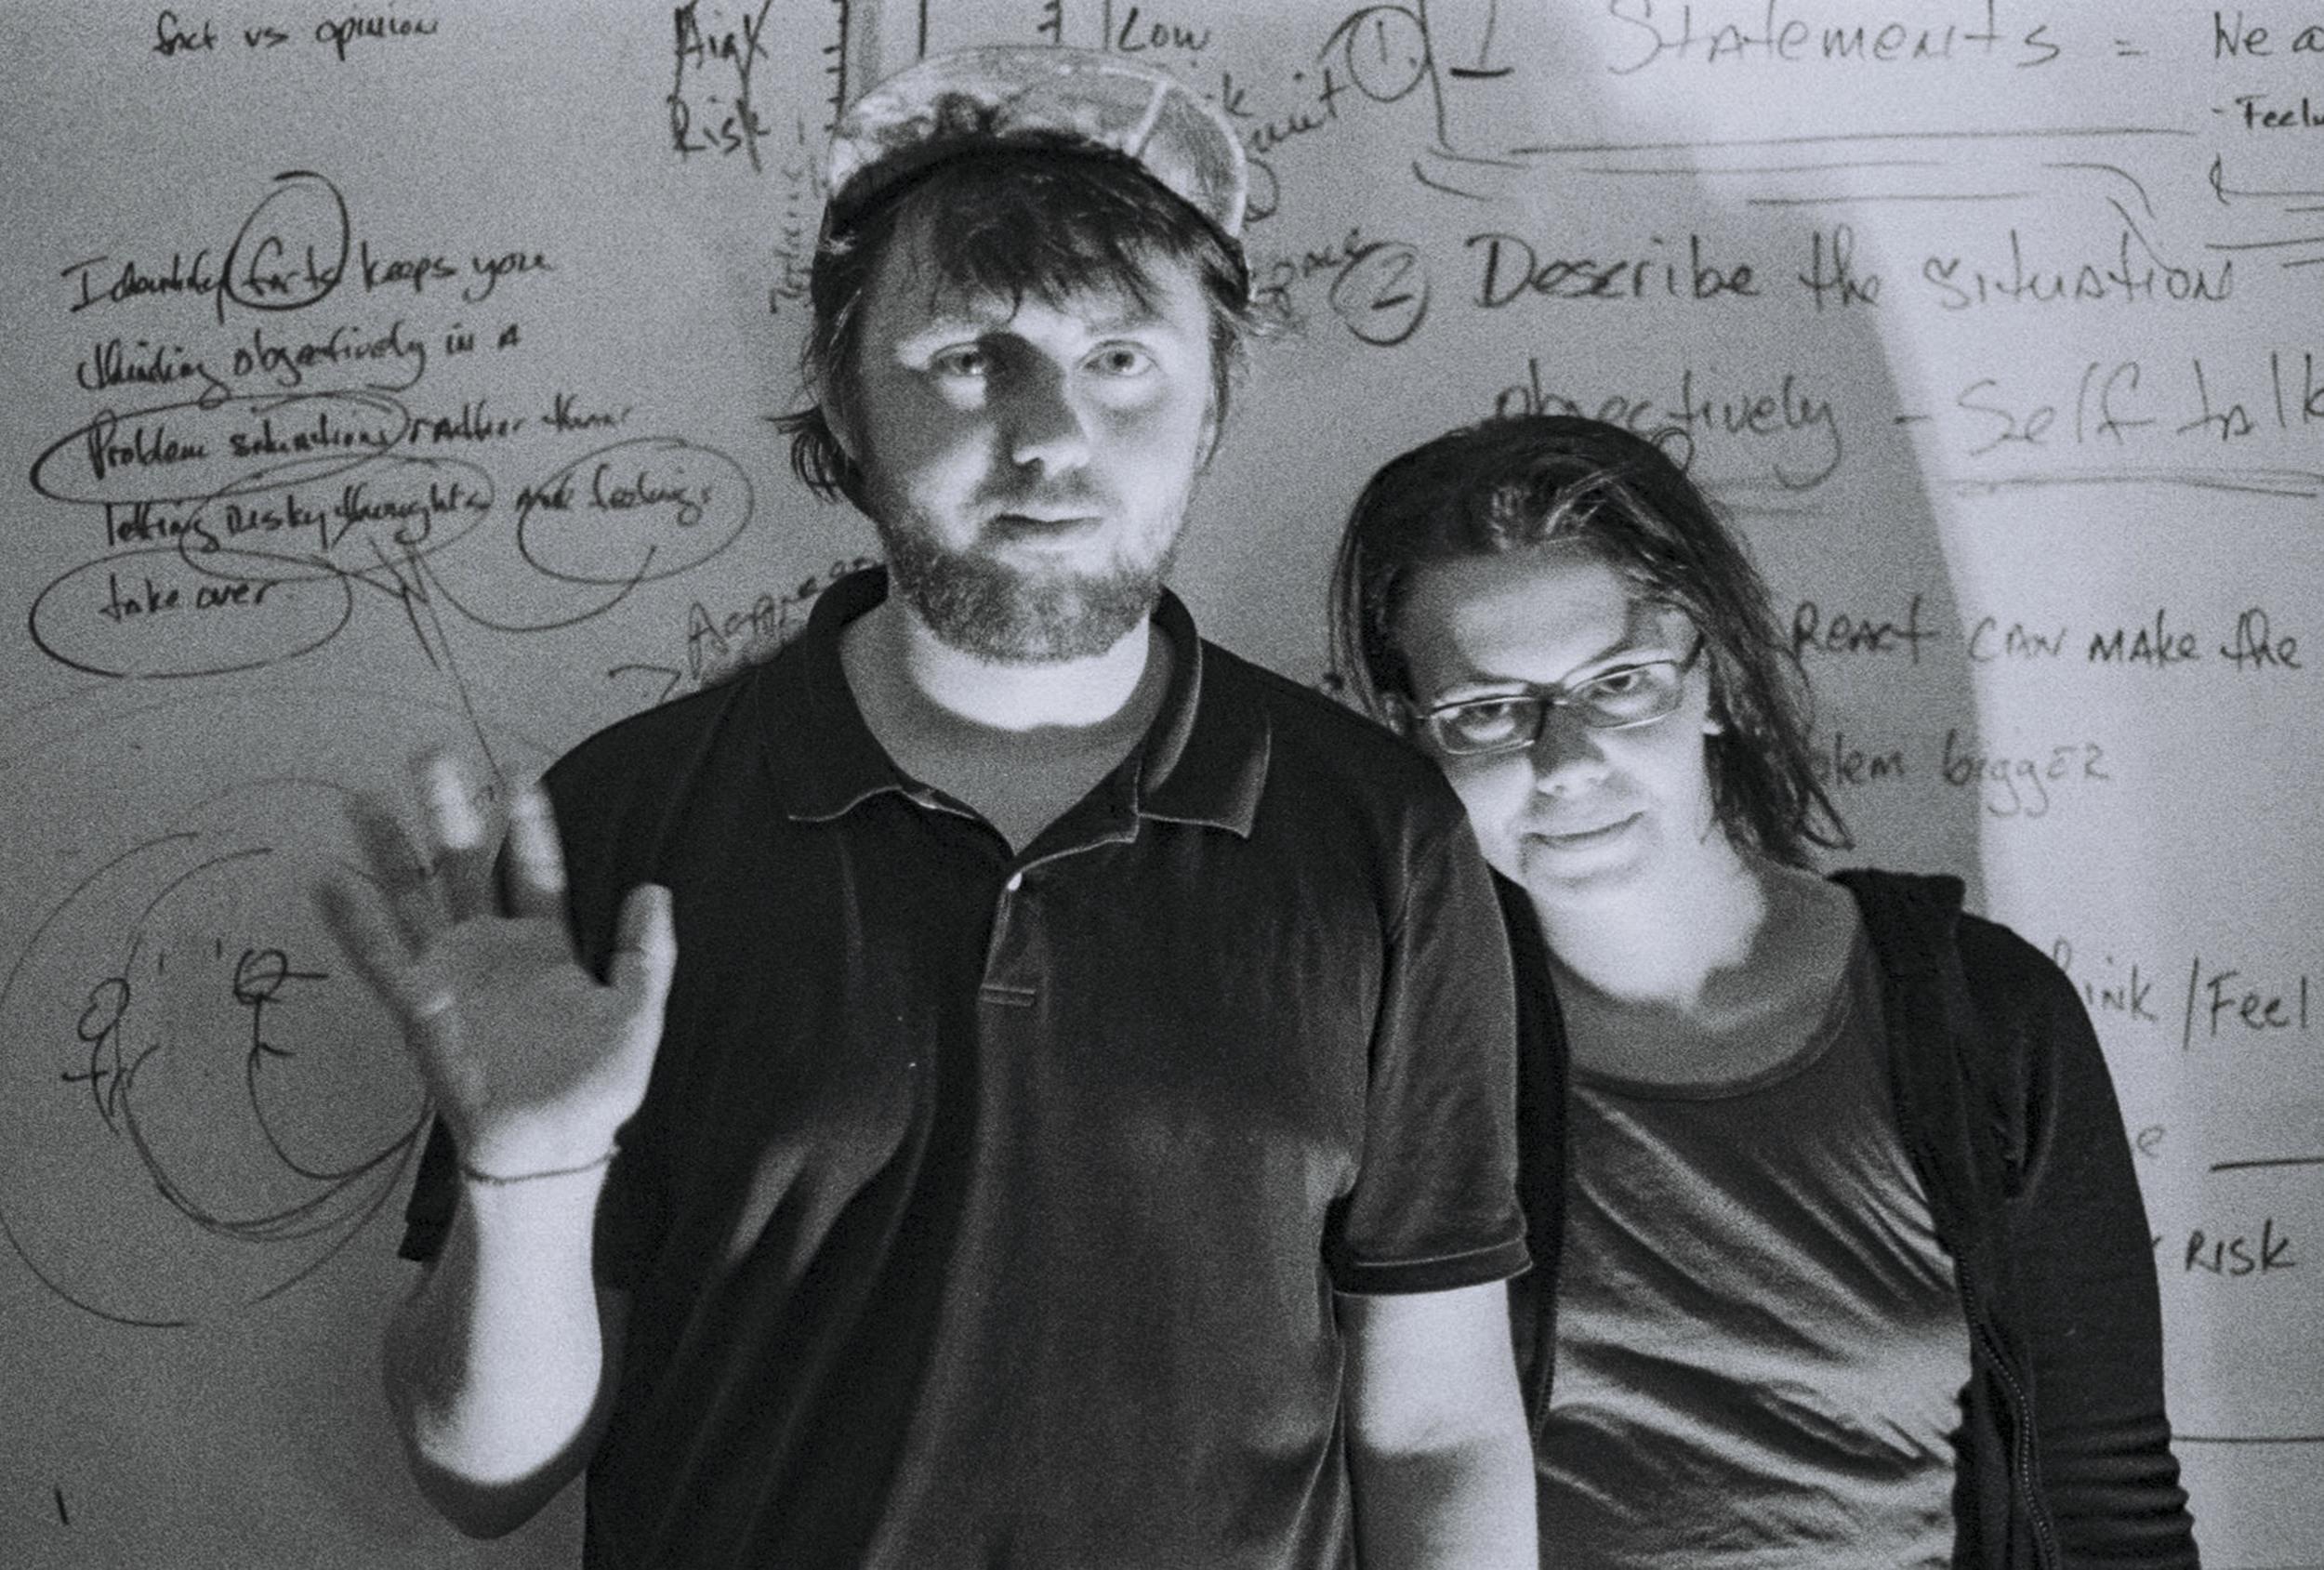 Mat Cothran and Delaney Mills of Elvis Depressedly.